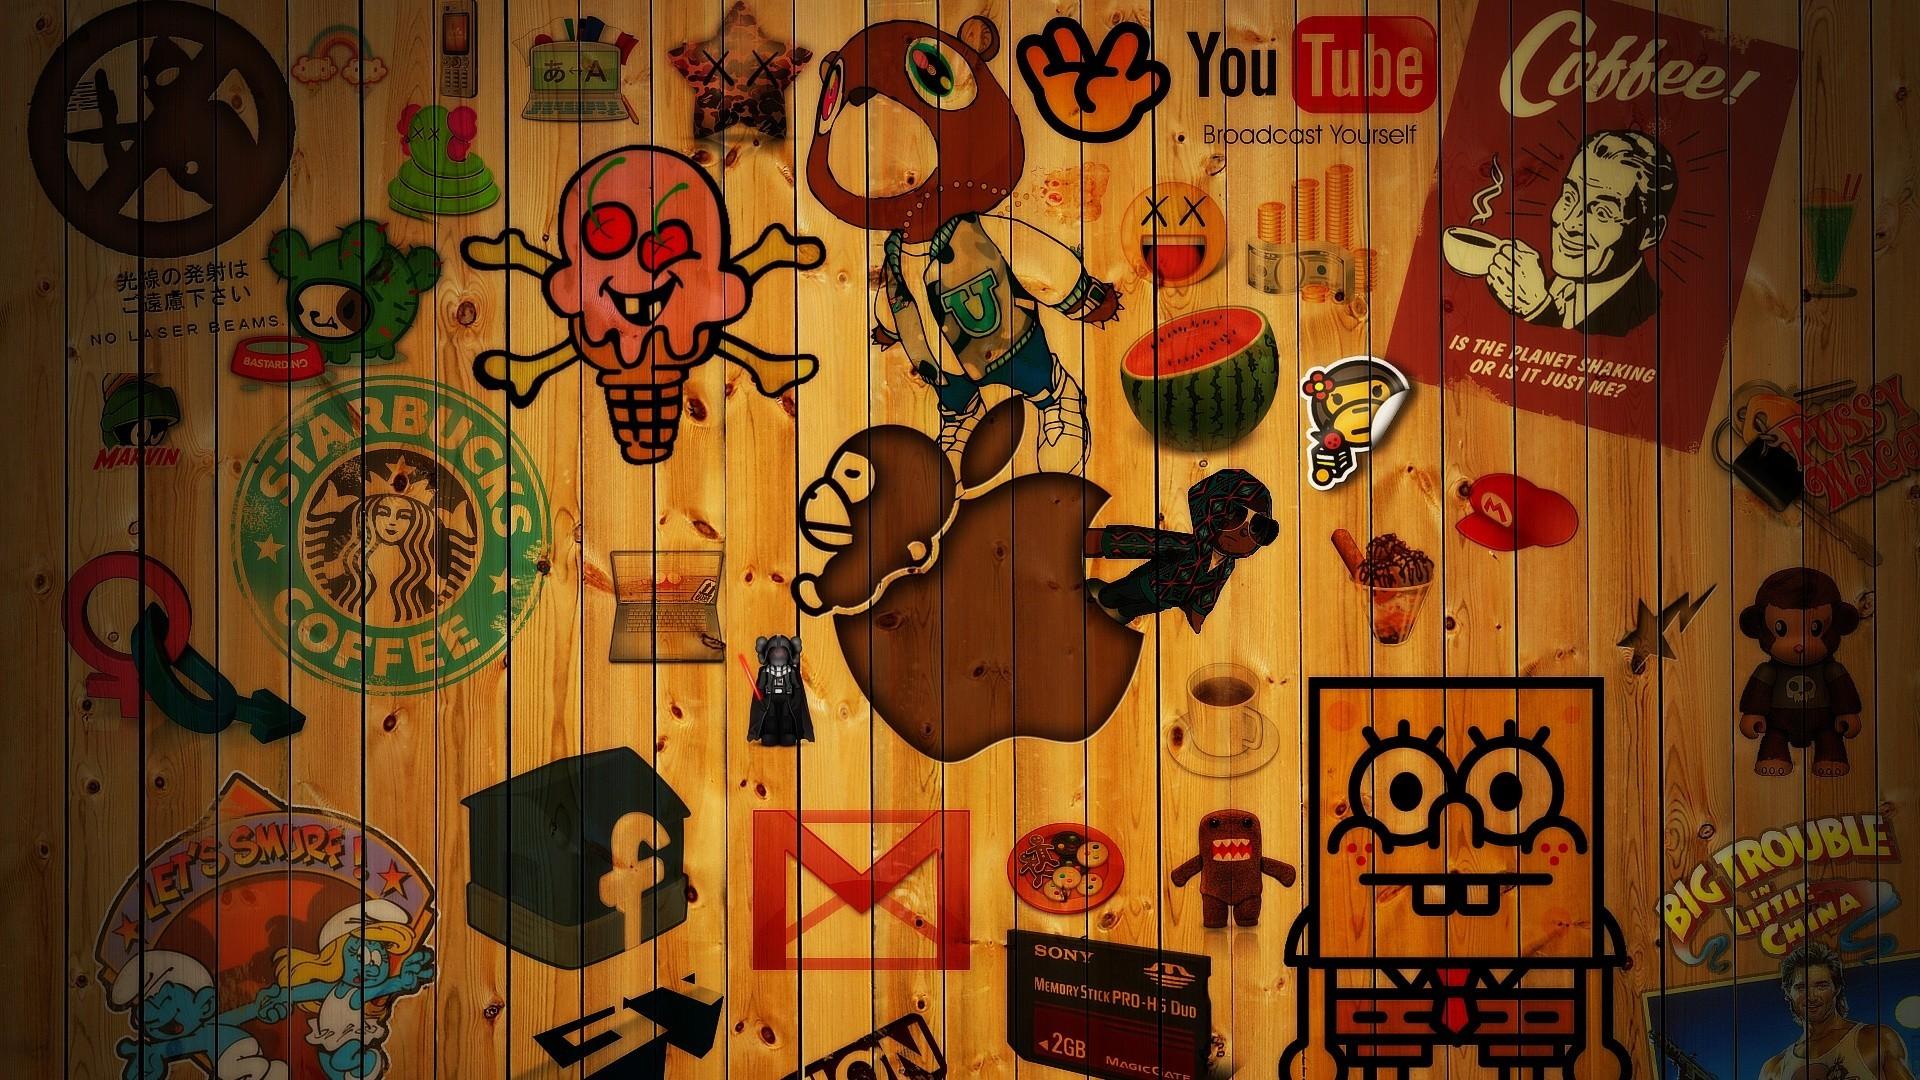 YouTube Wallpaper Backgrounds – WallpaperSafari